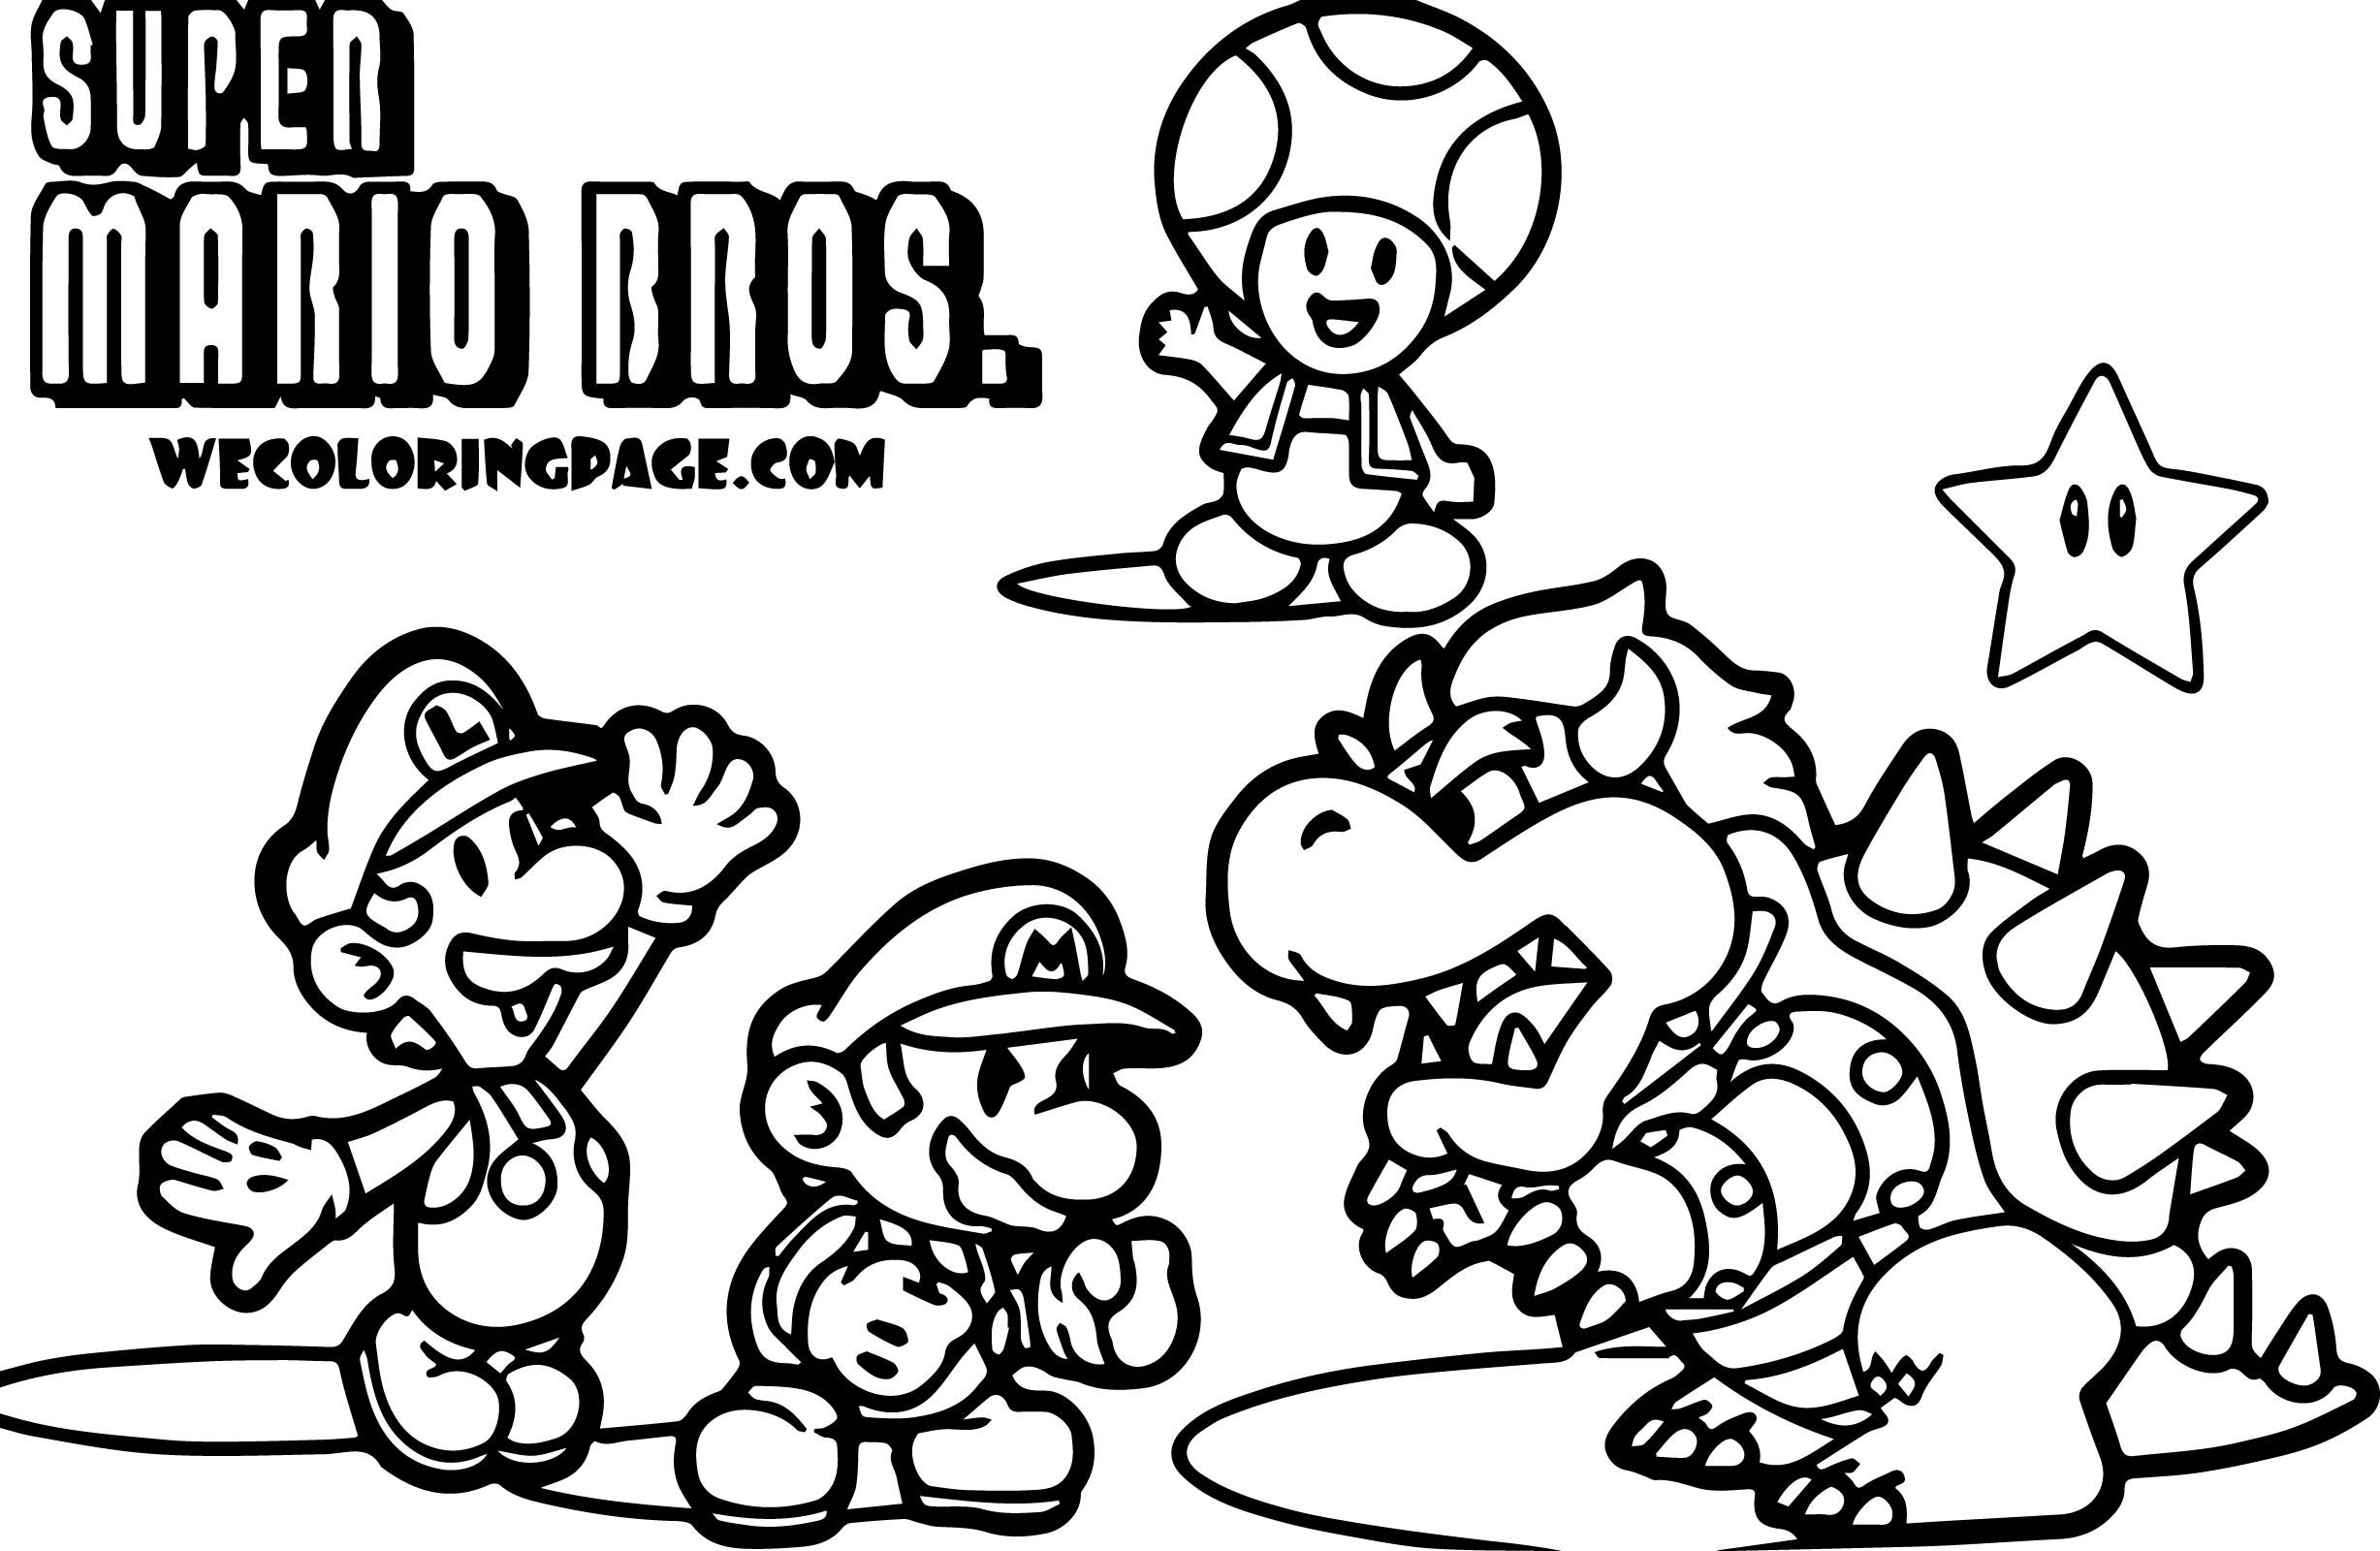 Mario Kart Ausmalbild Genial 37 Super Mario Kart Ausmalbilder Scoredatscore Inspirierend Super Sammlung